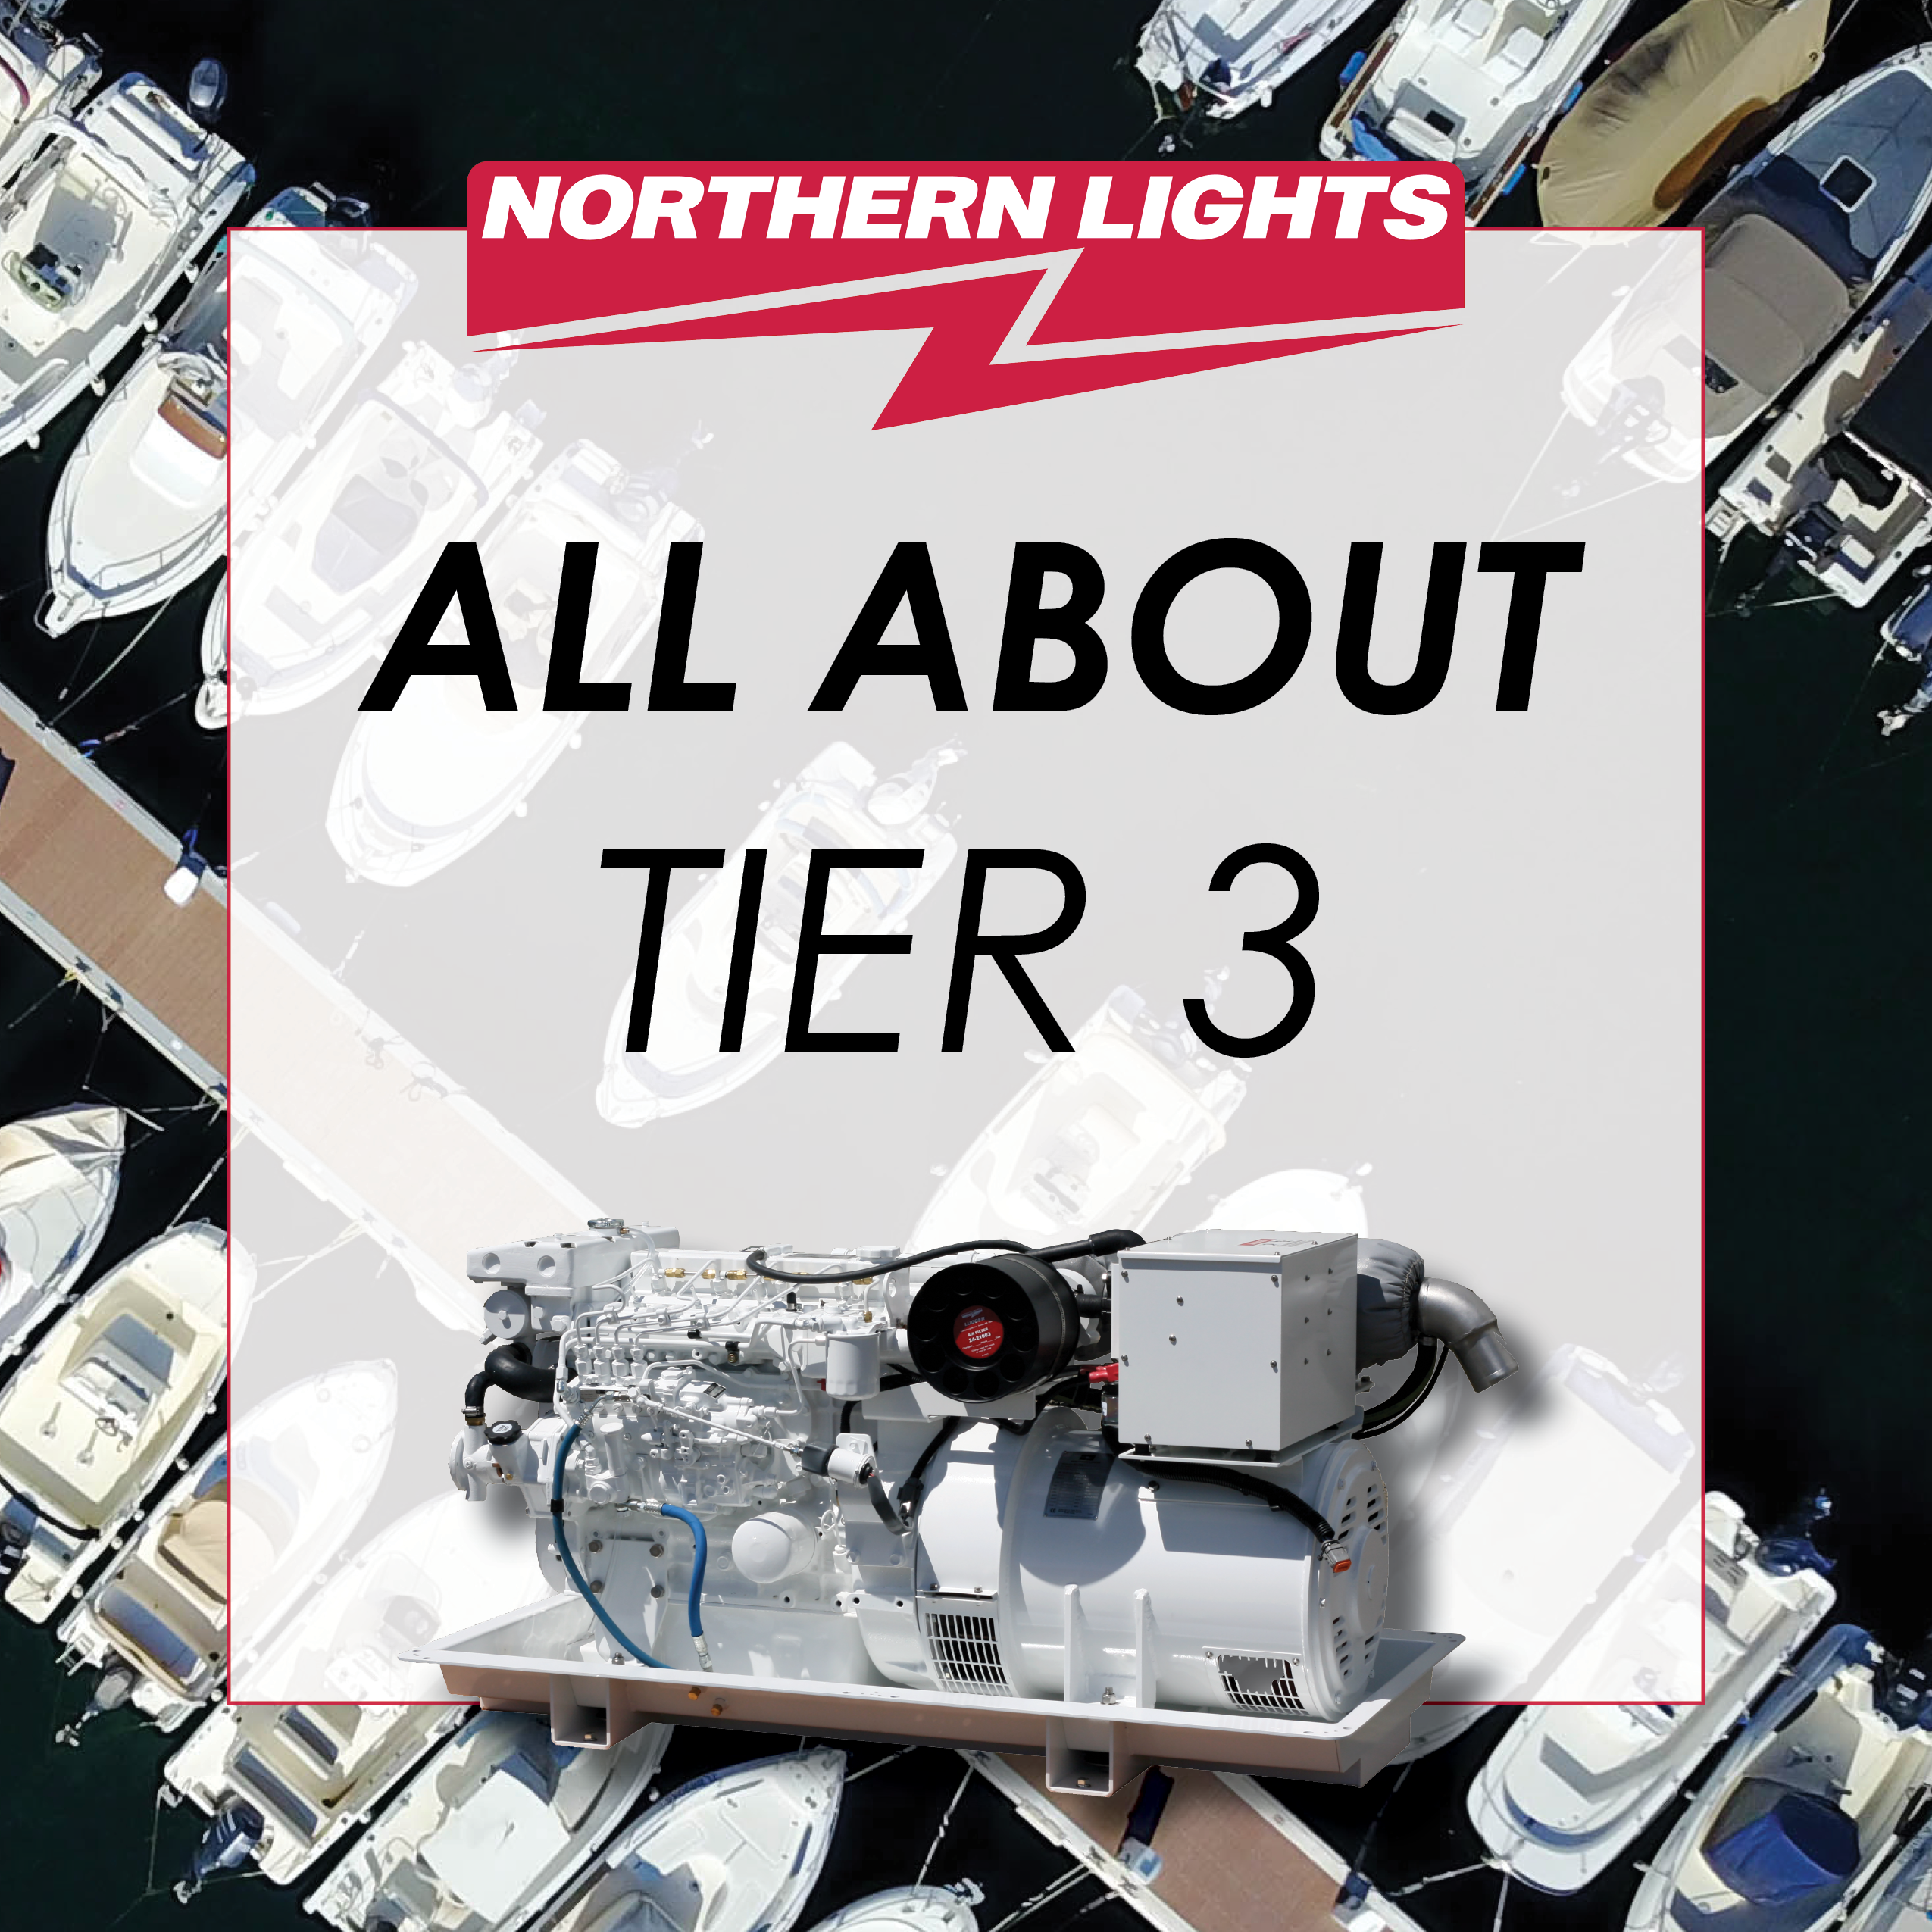 Us Epa Tier 3 Questions Answered Northern Lights Marine Generators